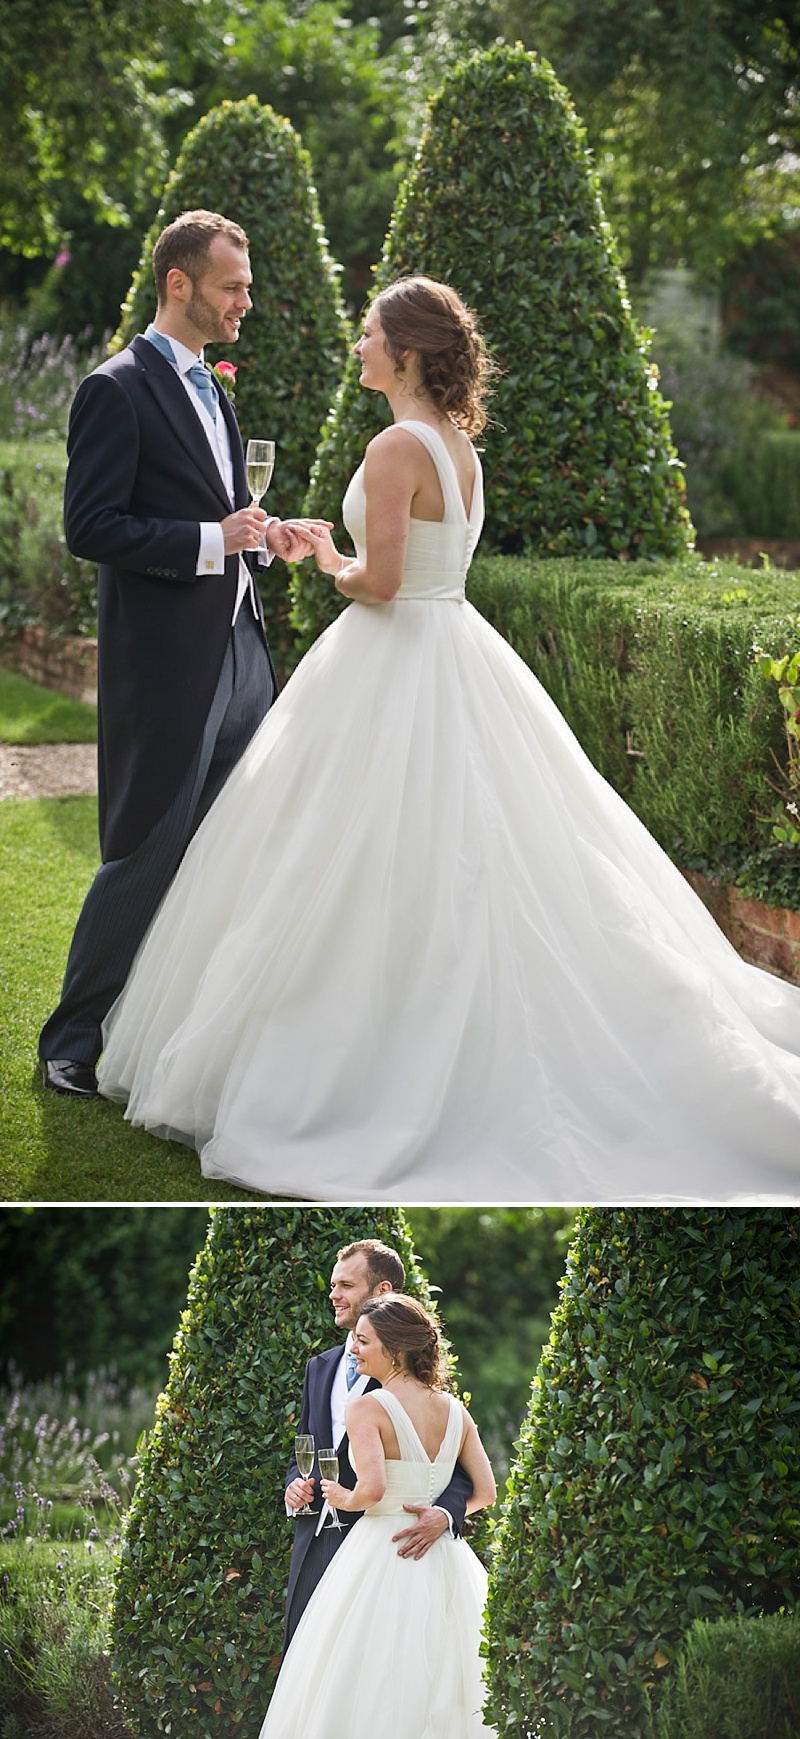 Ted Baker Wedding Dresses 14 Trend An Elegant Contemporary Wedding